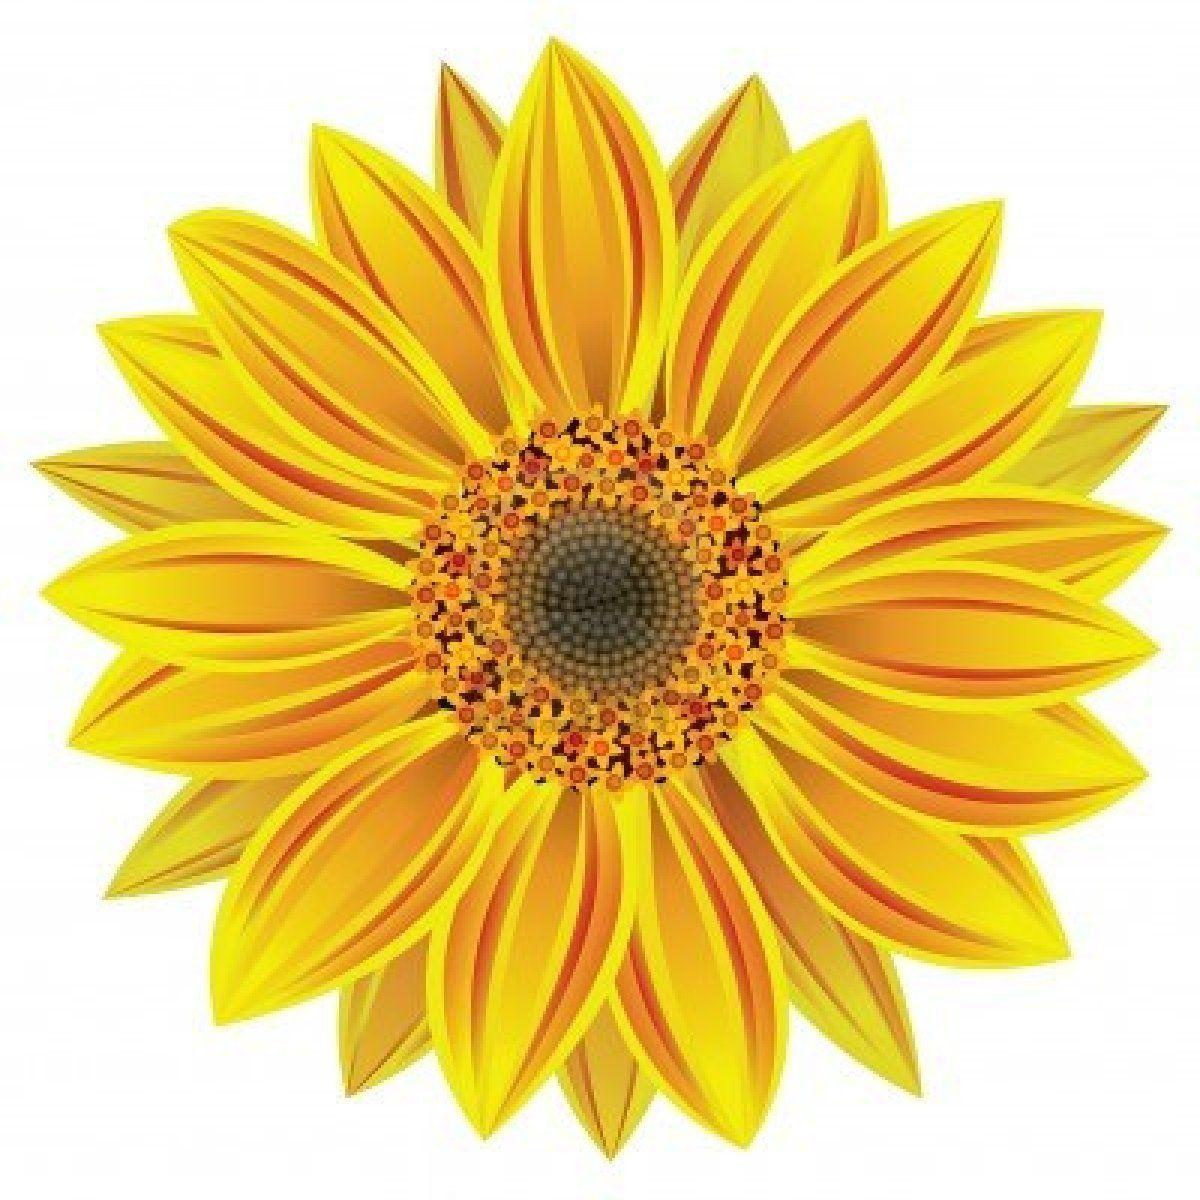 1200x1200 Vector Illustration Of Sunflower Ideas For Templatepattern